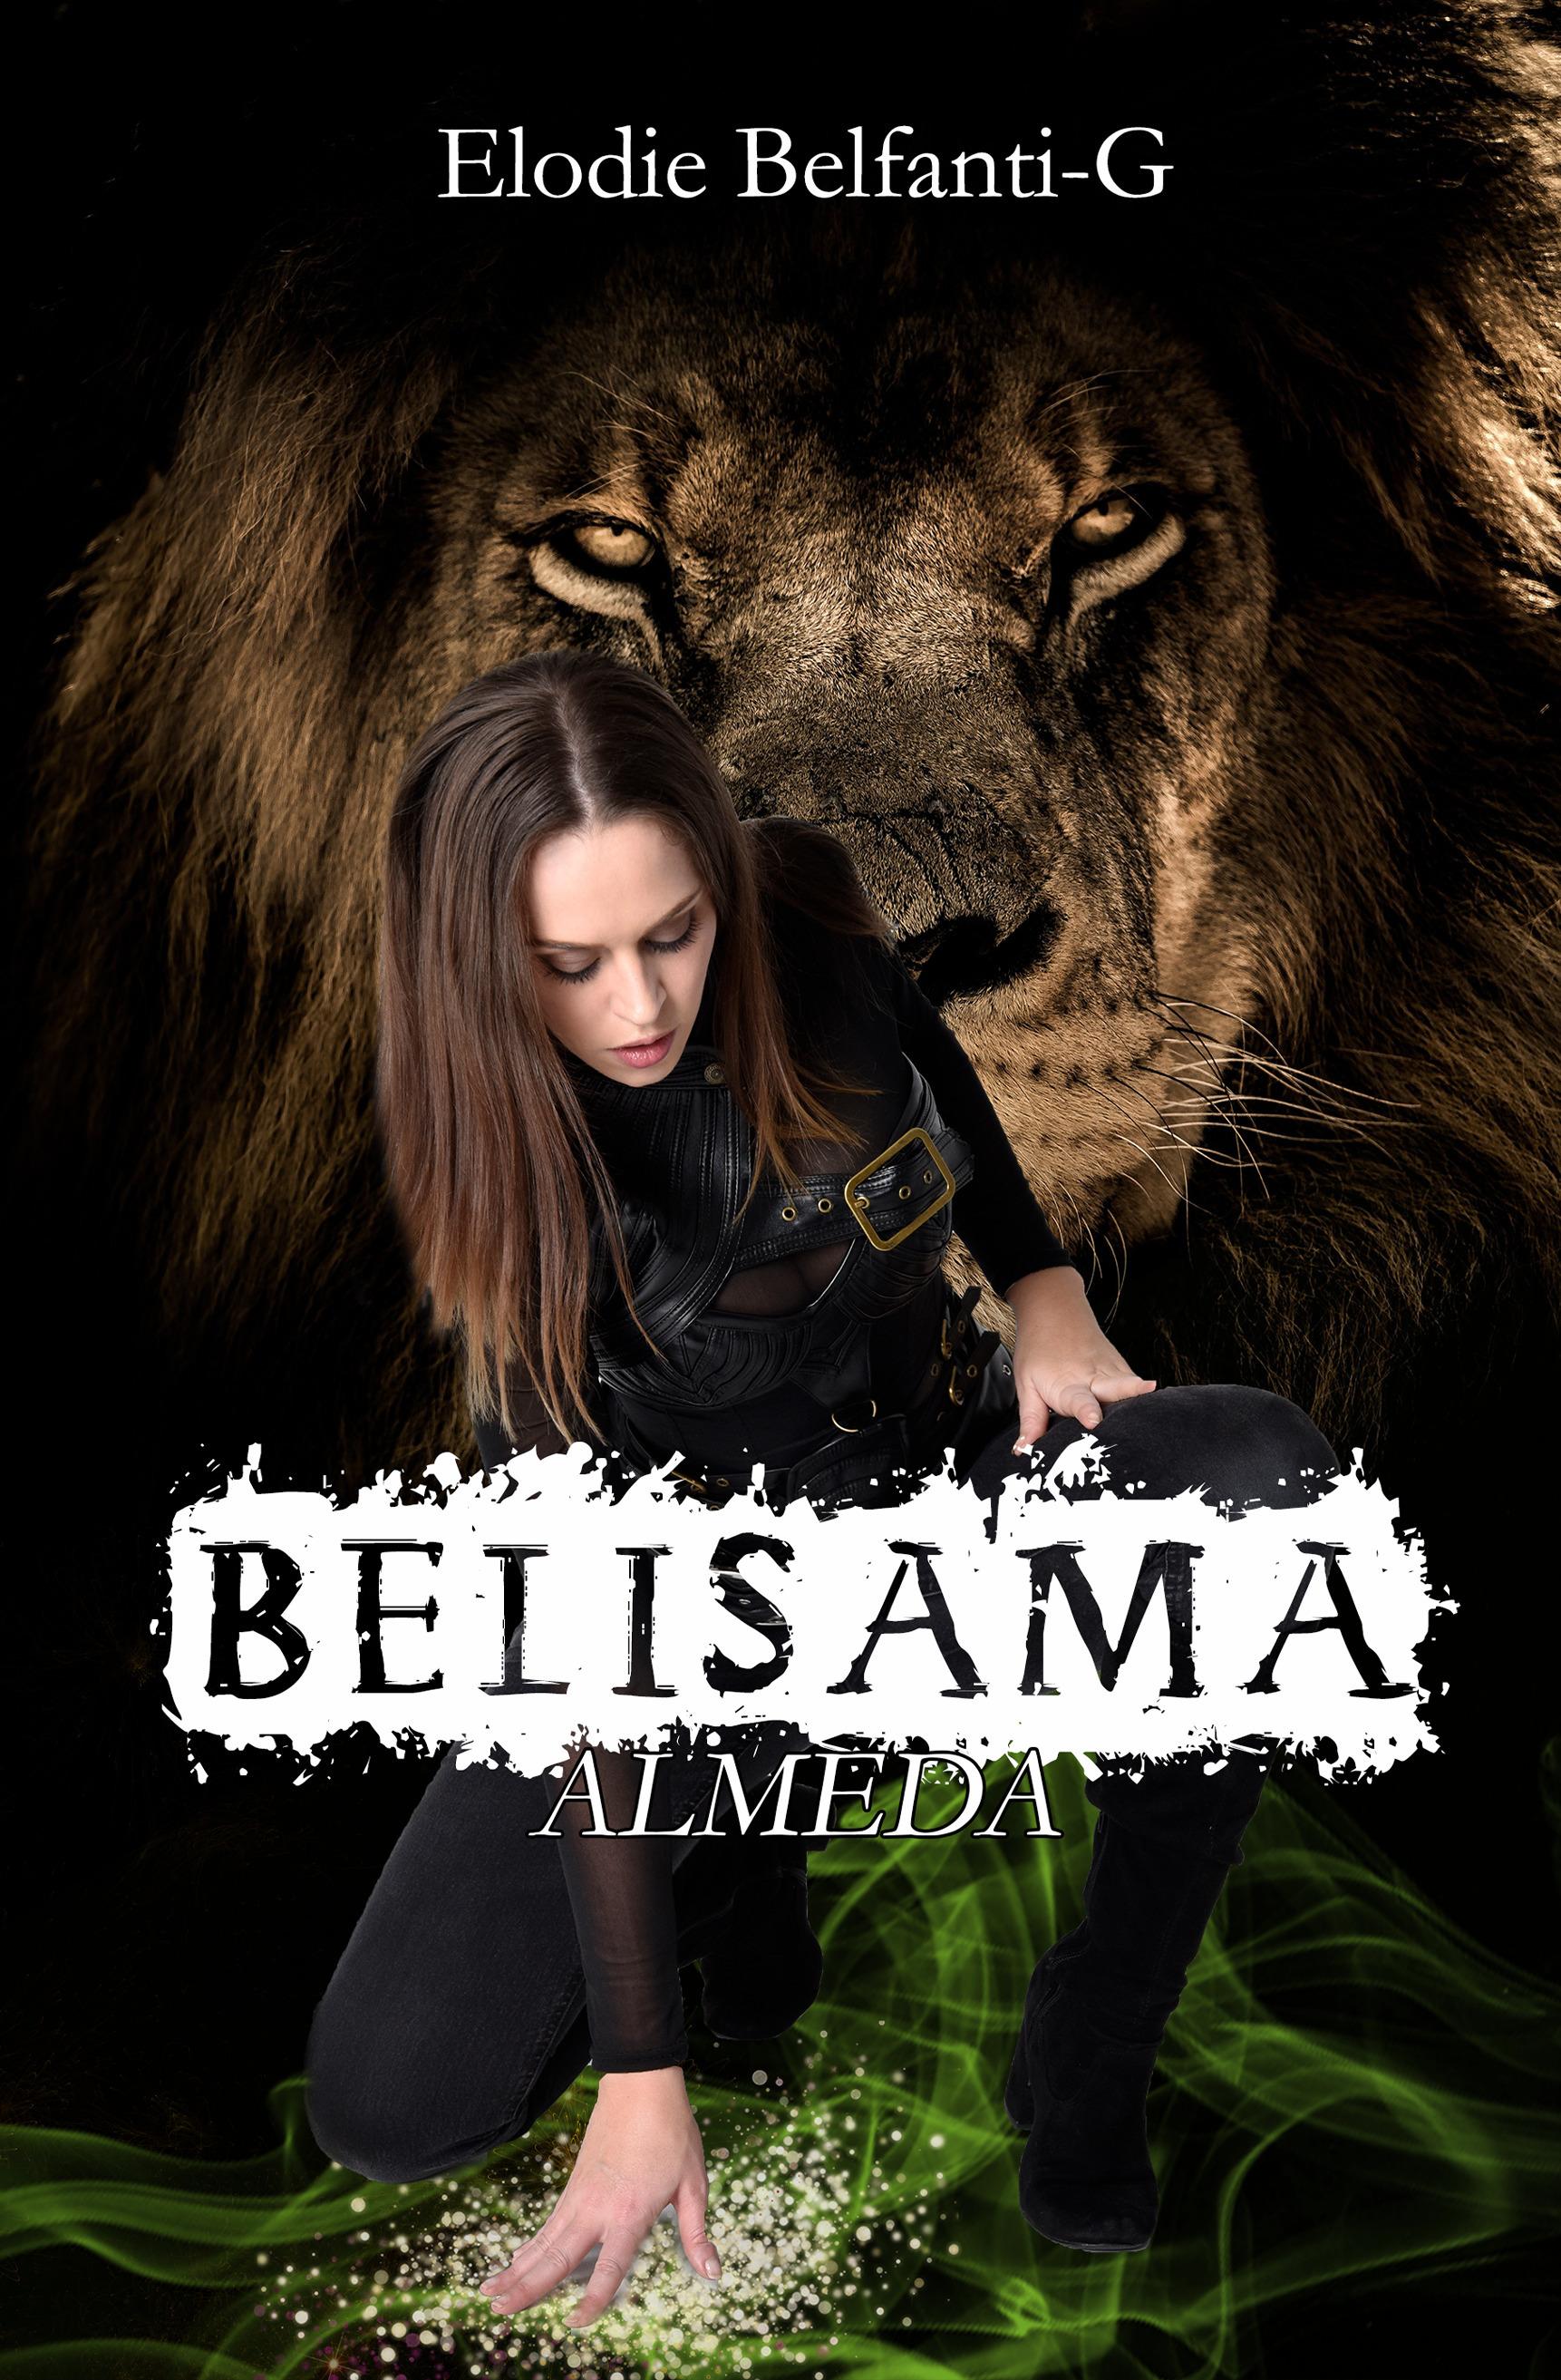 Belisama Almeda